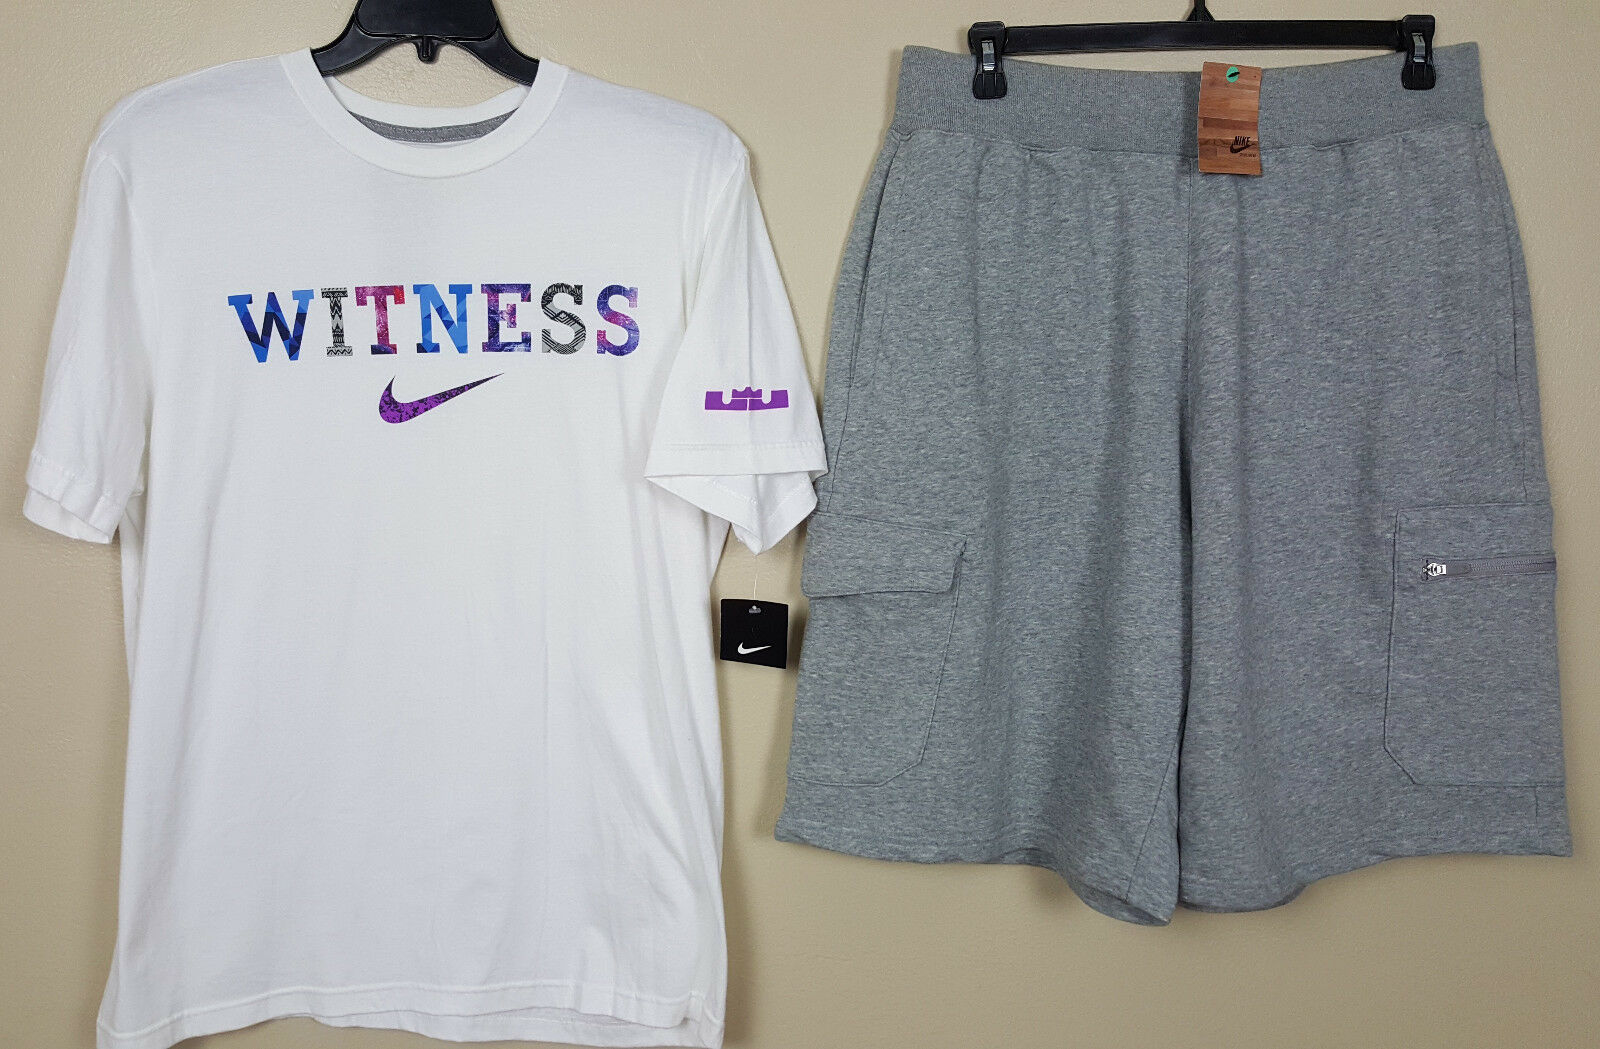 NIKE LEBRON WITNESS OUTFIT SHIRT + SHORTS WHITE GREY BLACK 3 ITEMS NEW (SIZE XL)